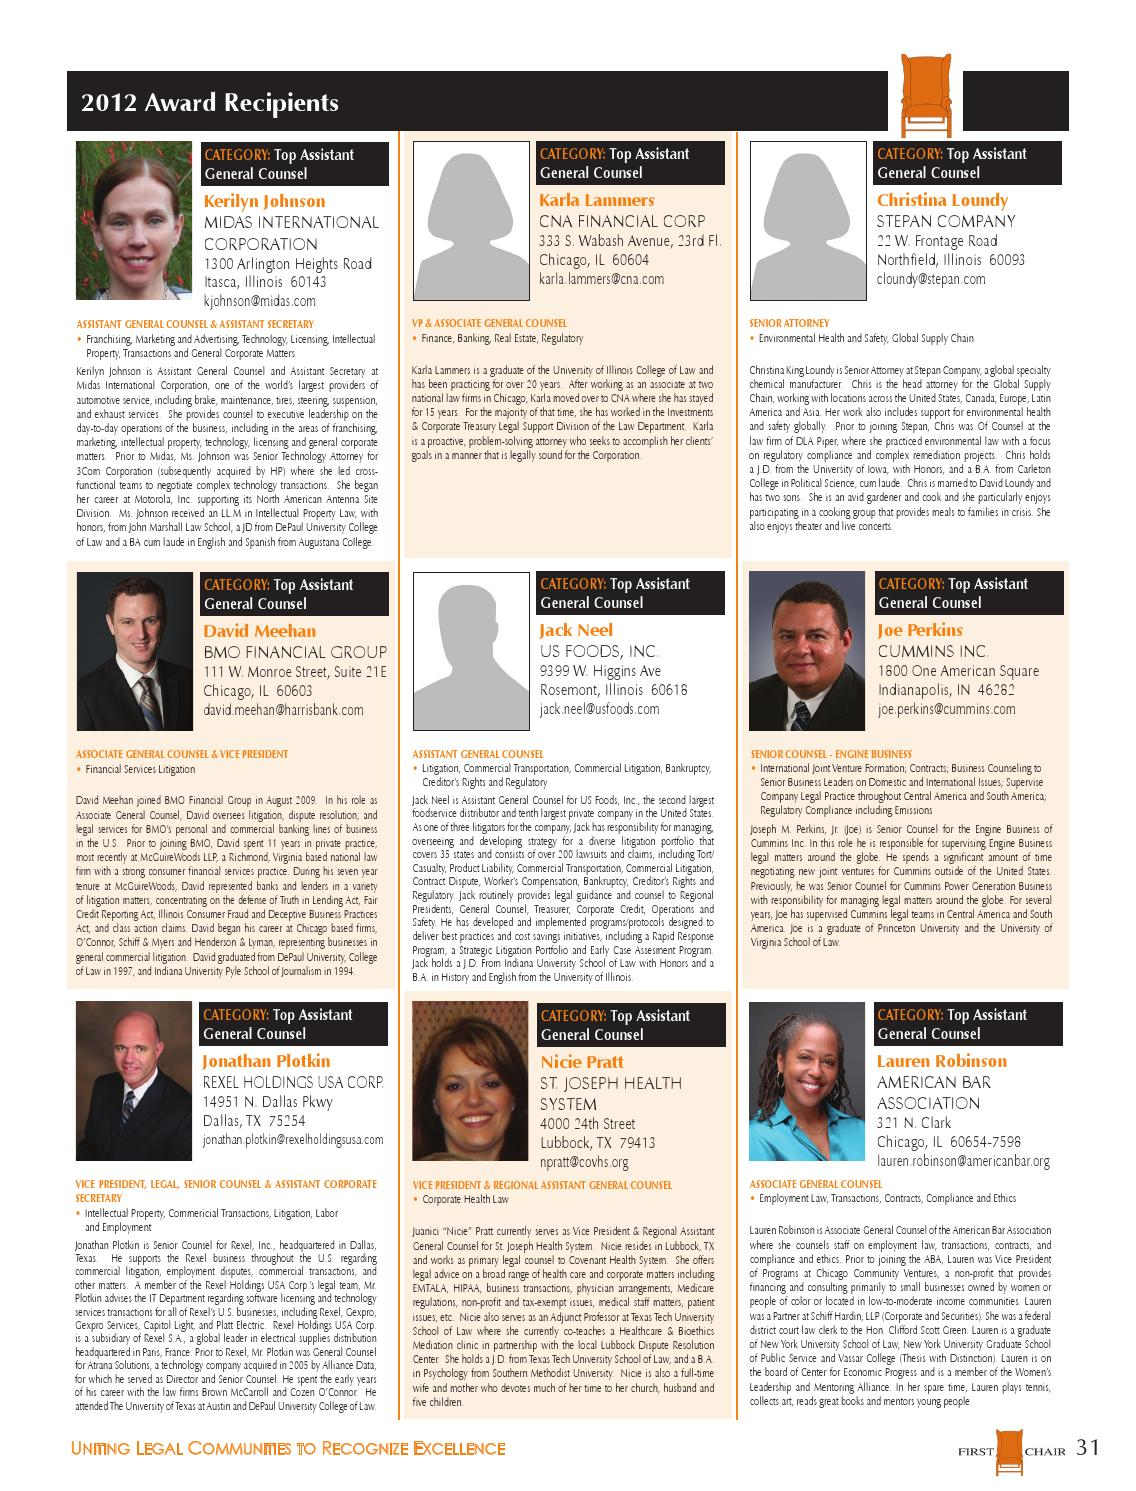 2013 First Chair Magazine by firstchair - issuu